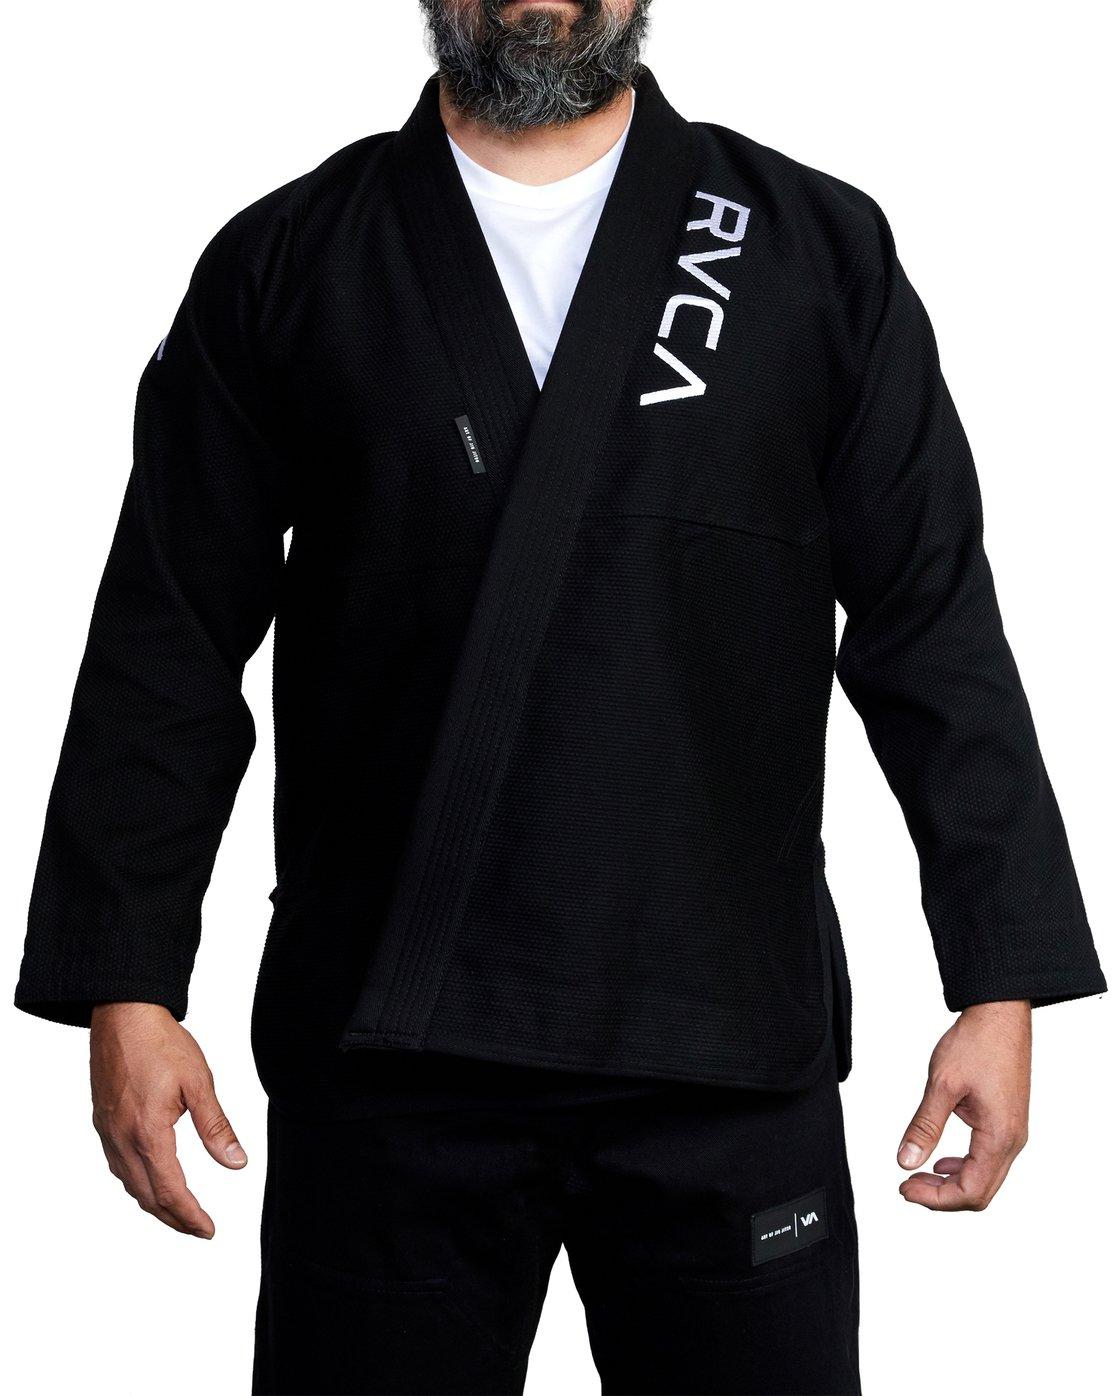 7 Art of Jiu Jitsu - Jiu Jitsu Gi pour Homme Noir R4ESRARVW9 RVCA